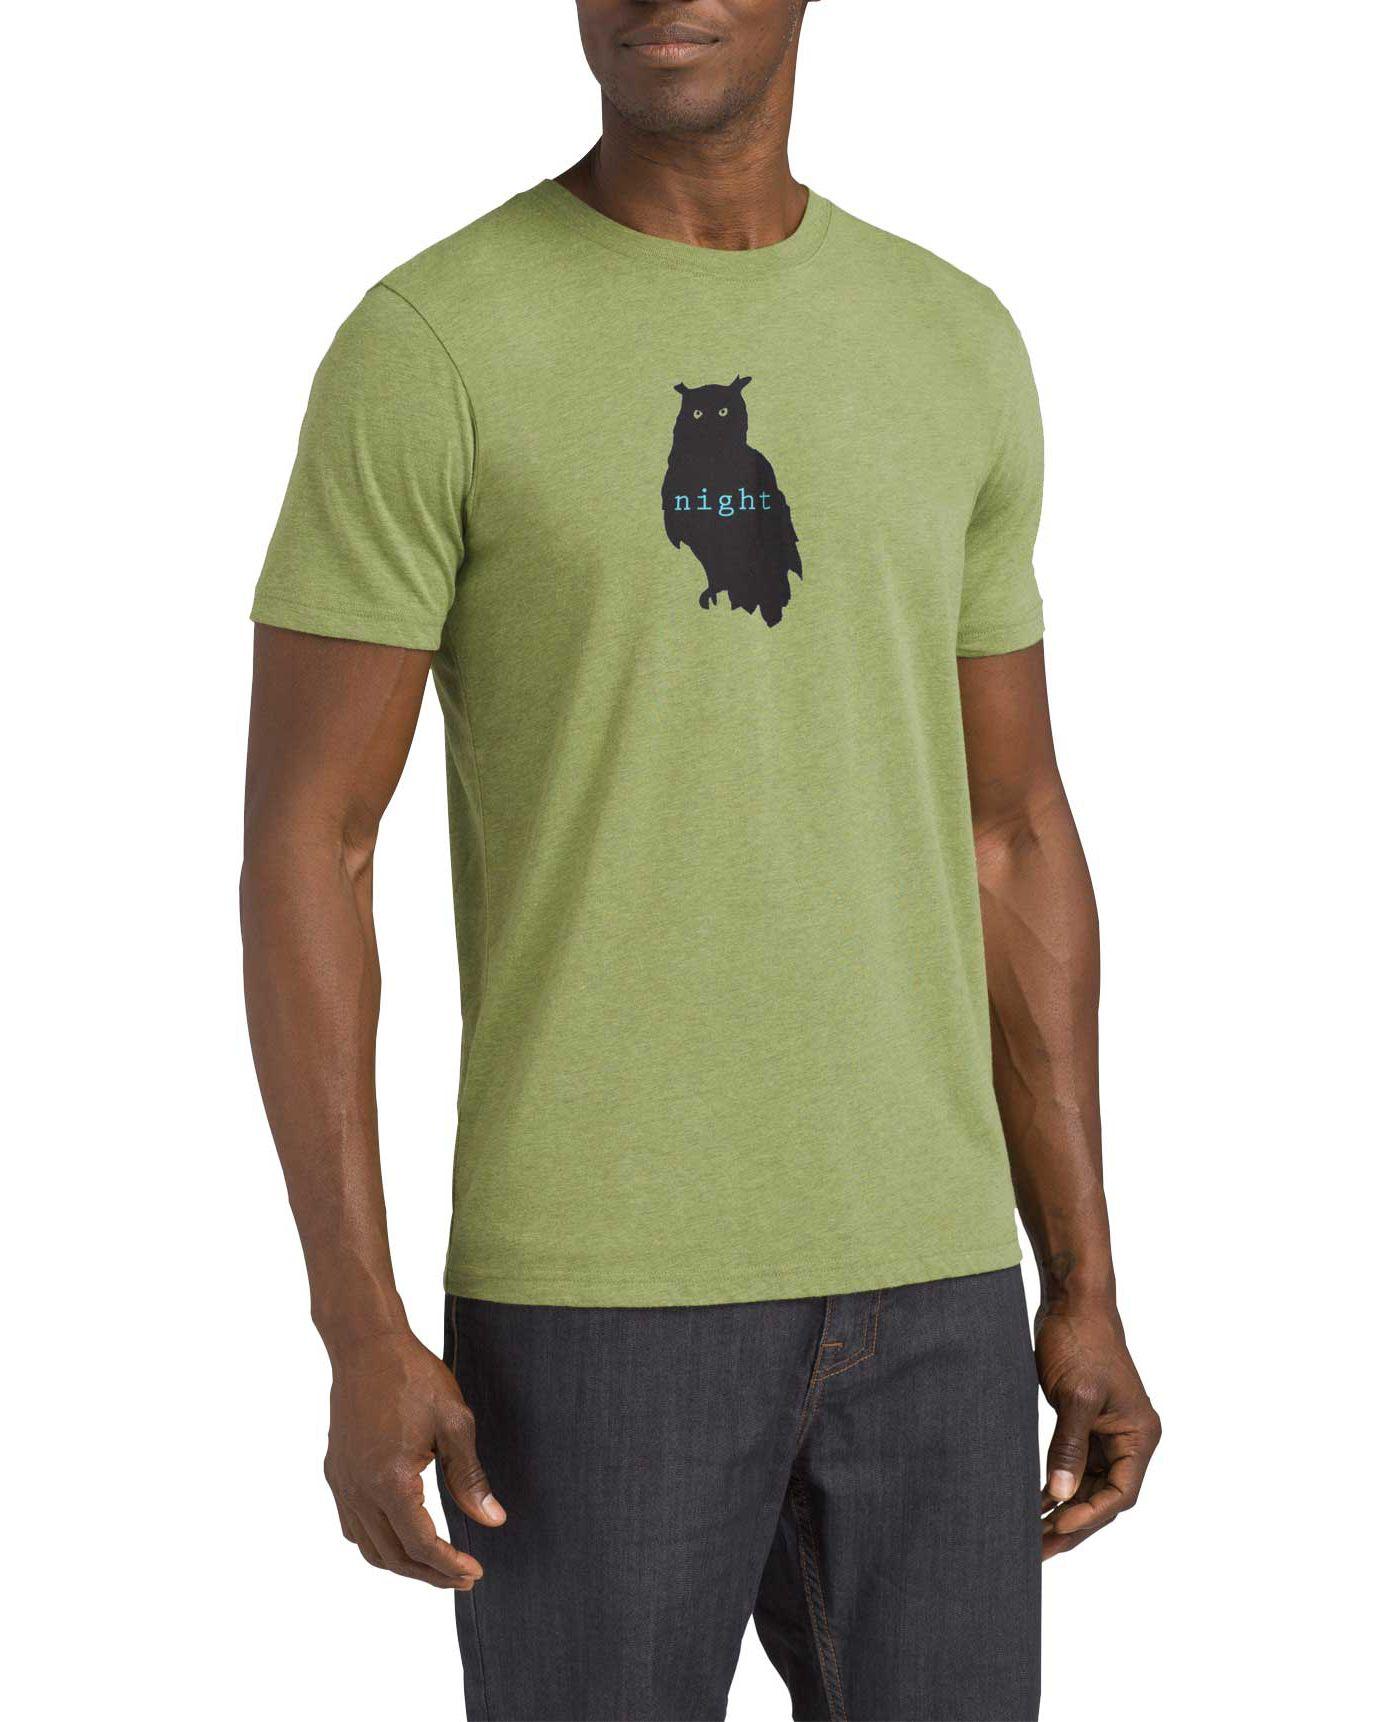 prAna Men's Night Owl Journeyman T-Shirt